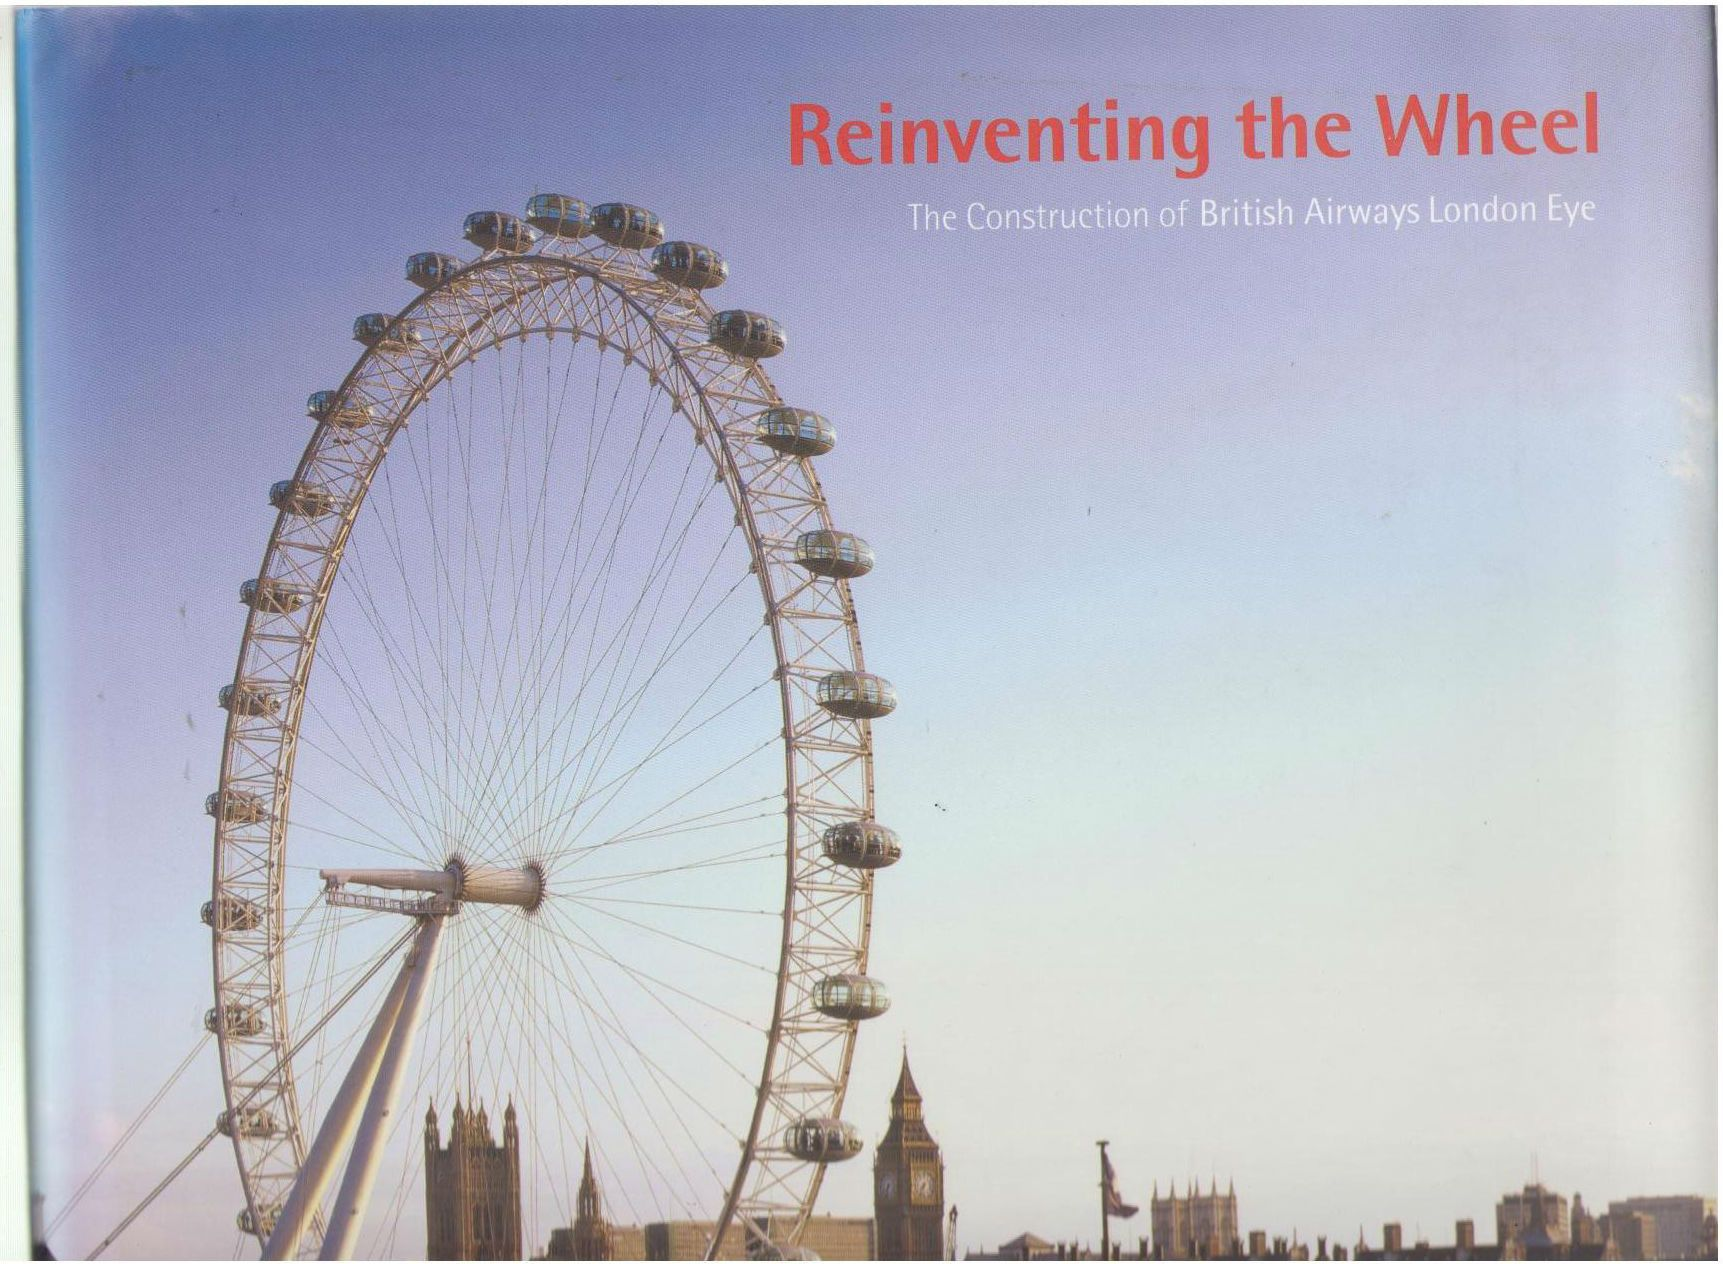 Reinventing the Wheel: The Construction of British Airways London Eye, Lambot, Ian